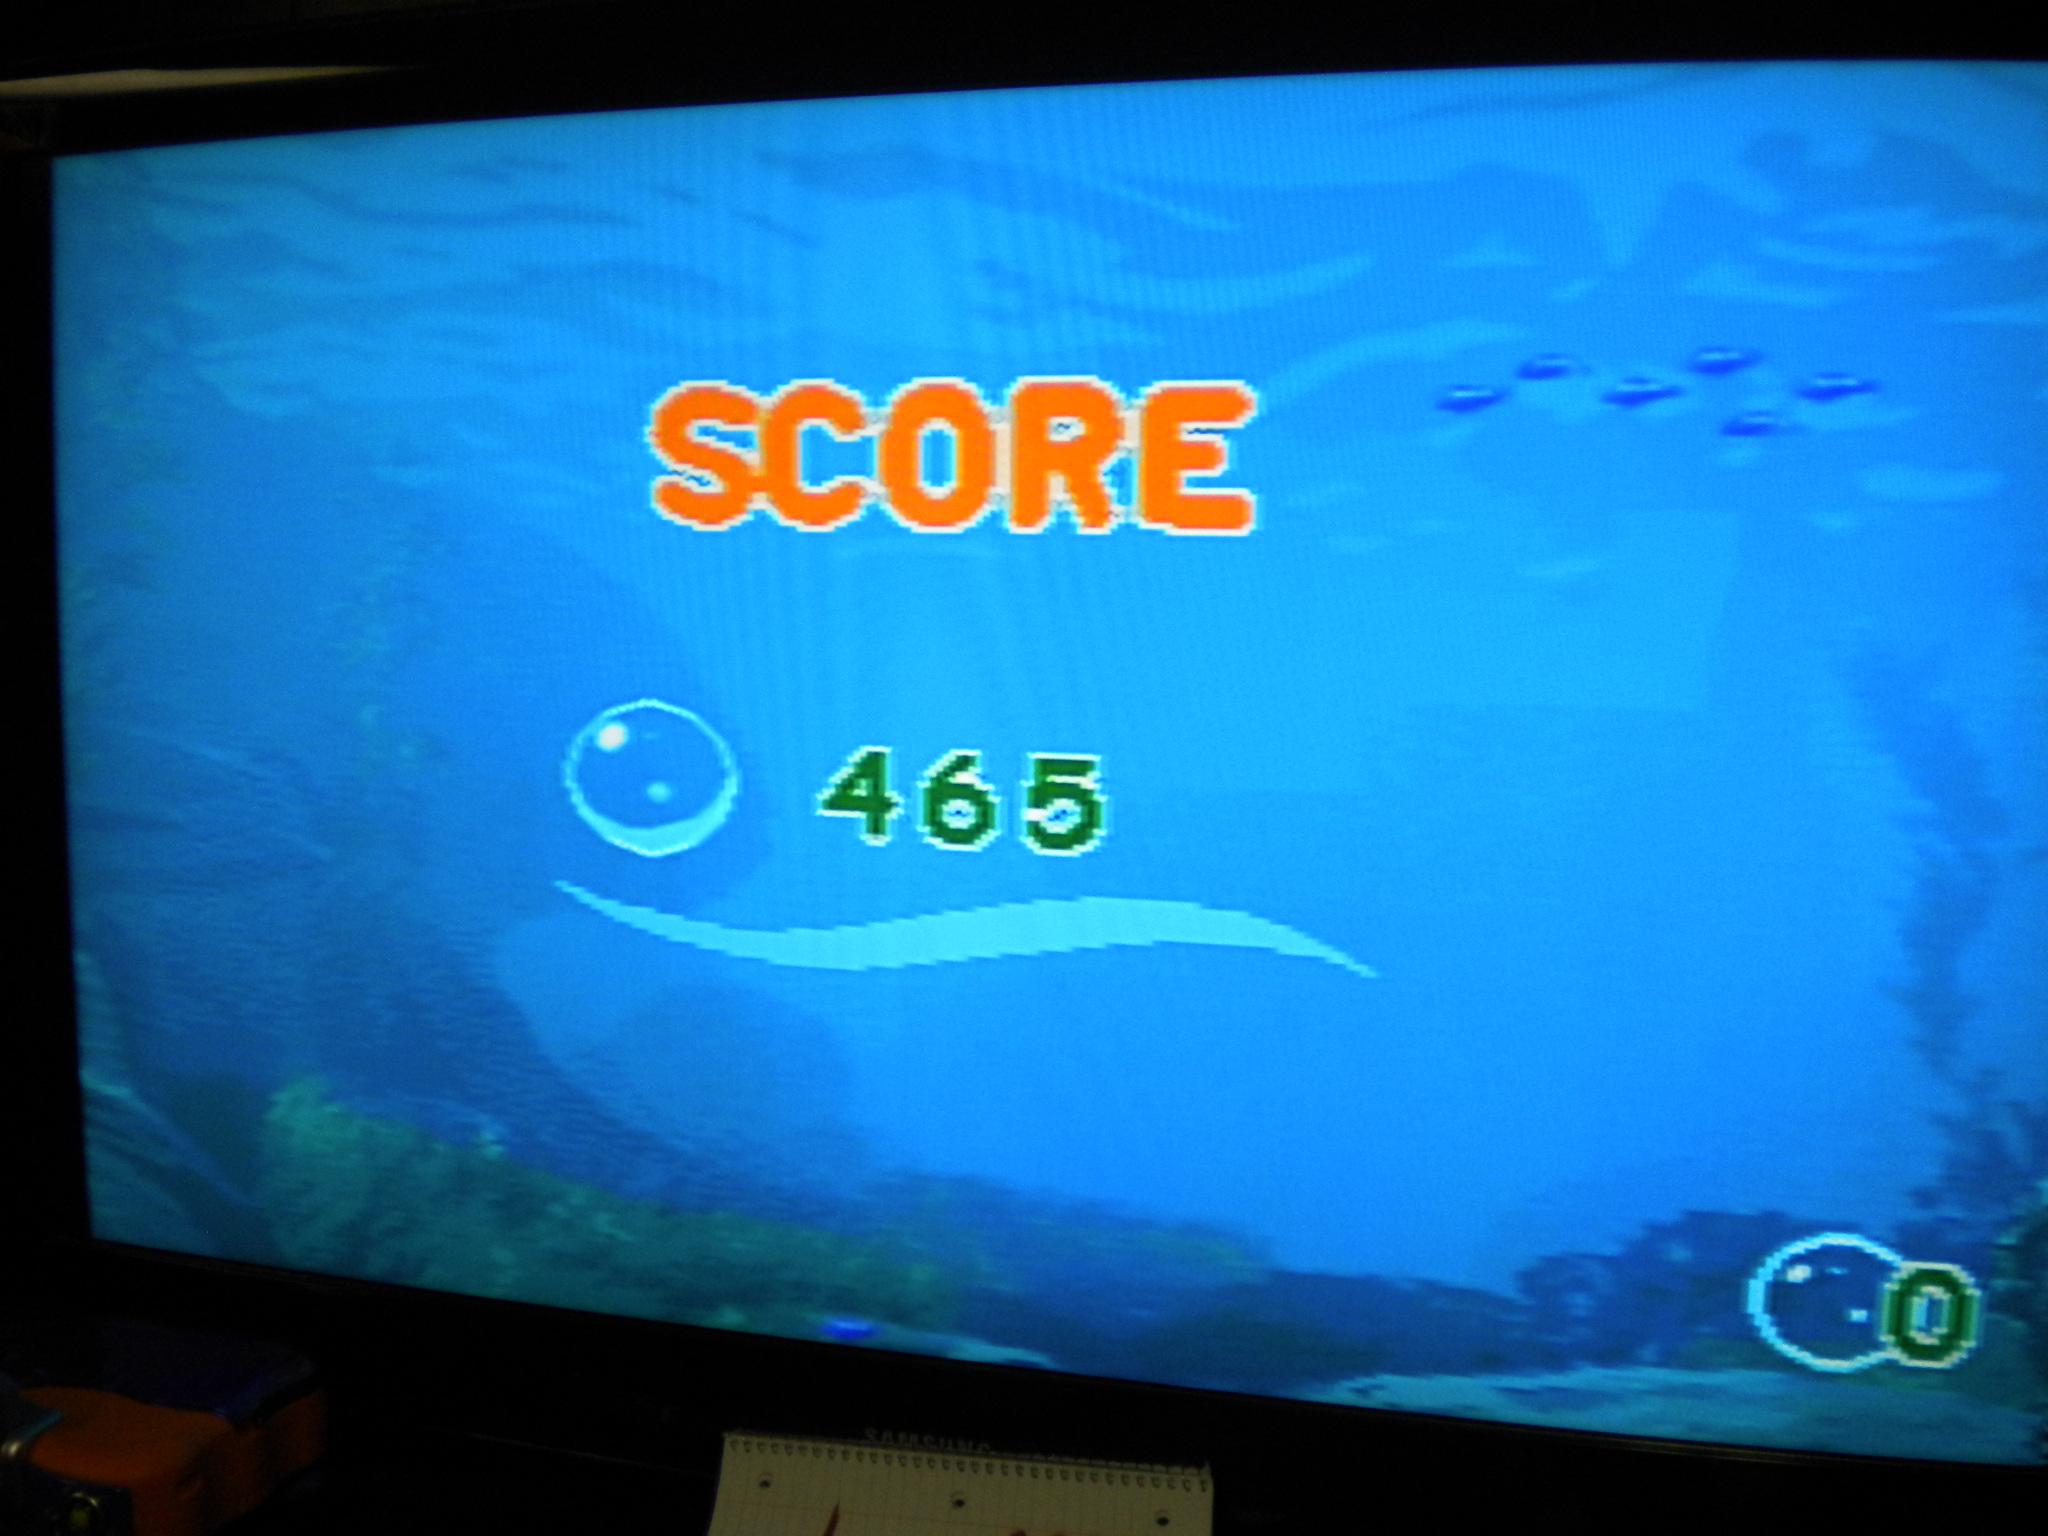 Finding Nemo: Nemo